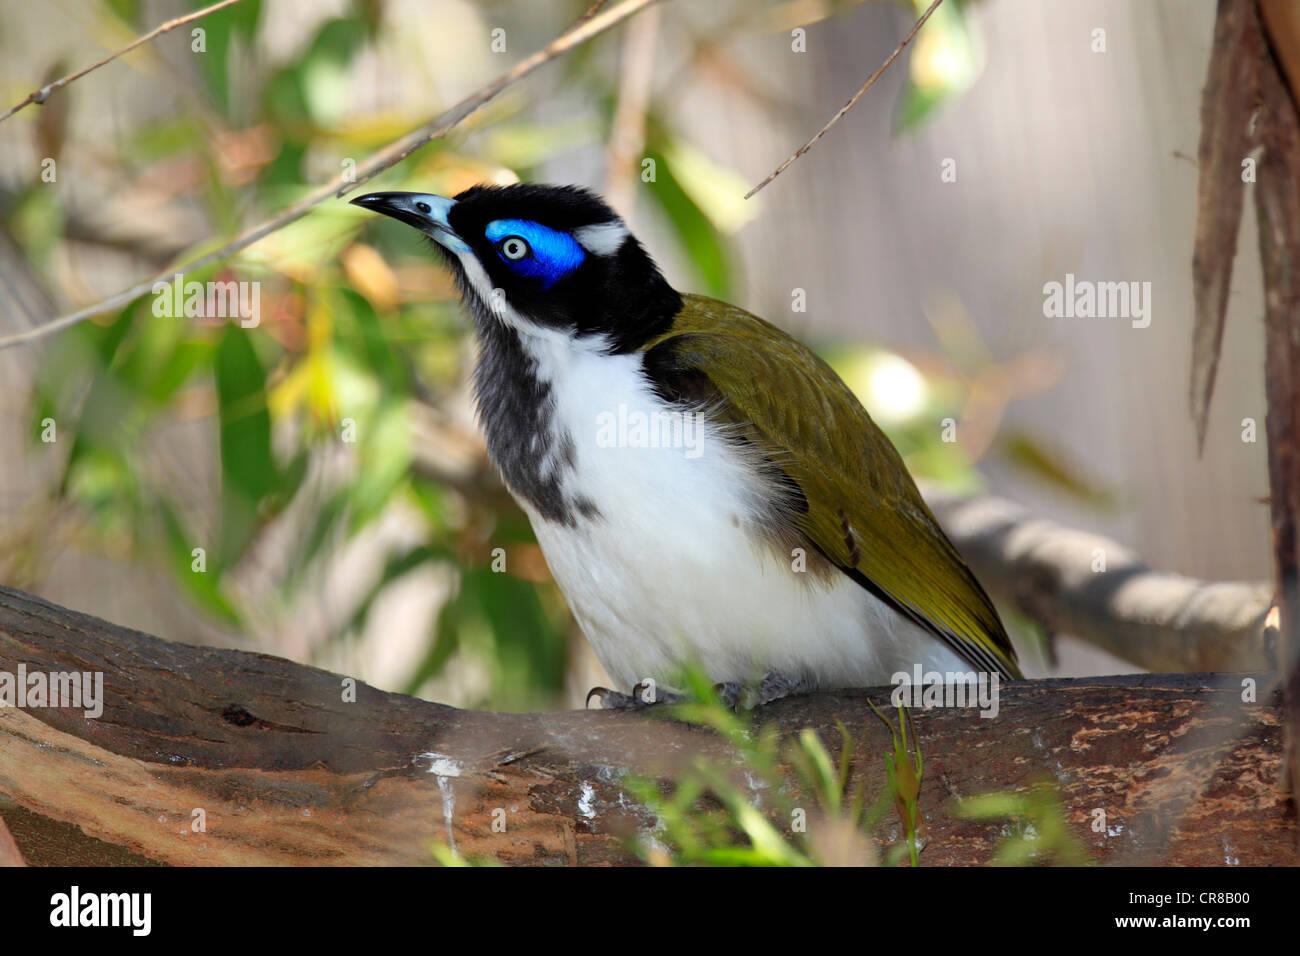 Blue -faced Honeyeater or Bananabird (Entomyzon cyanotis), Outback, Northern Territory, Australia - Stock Image